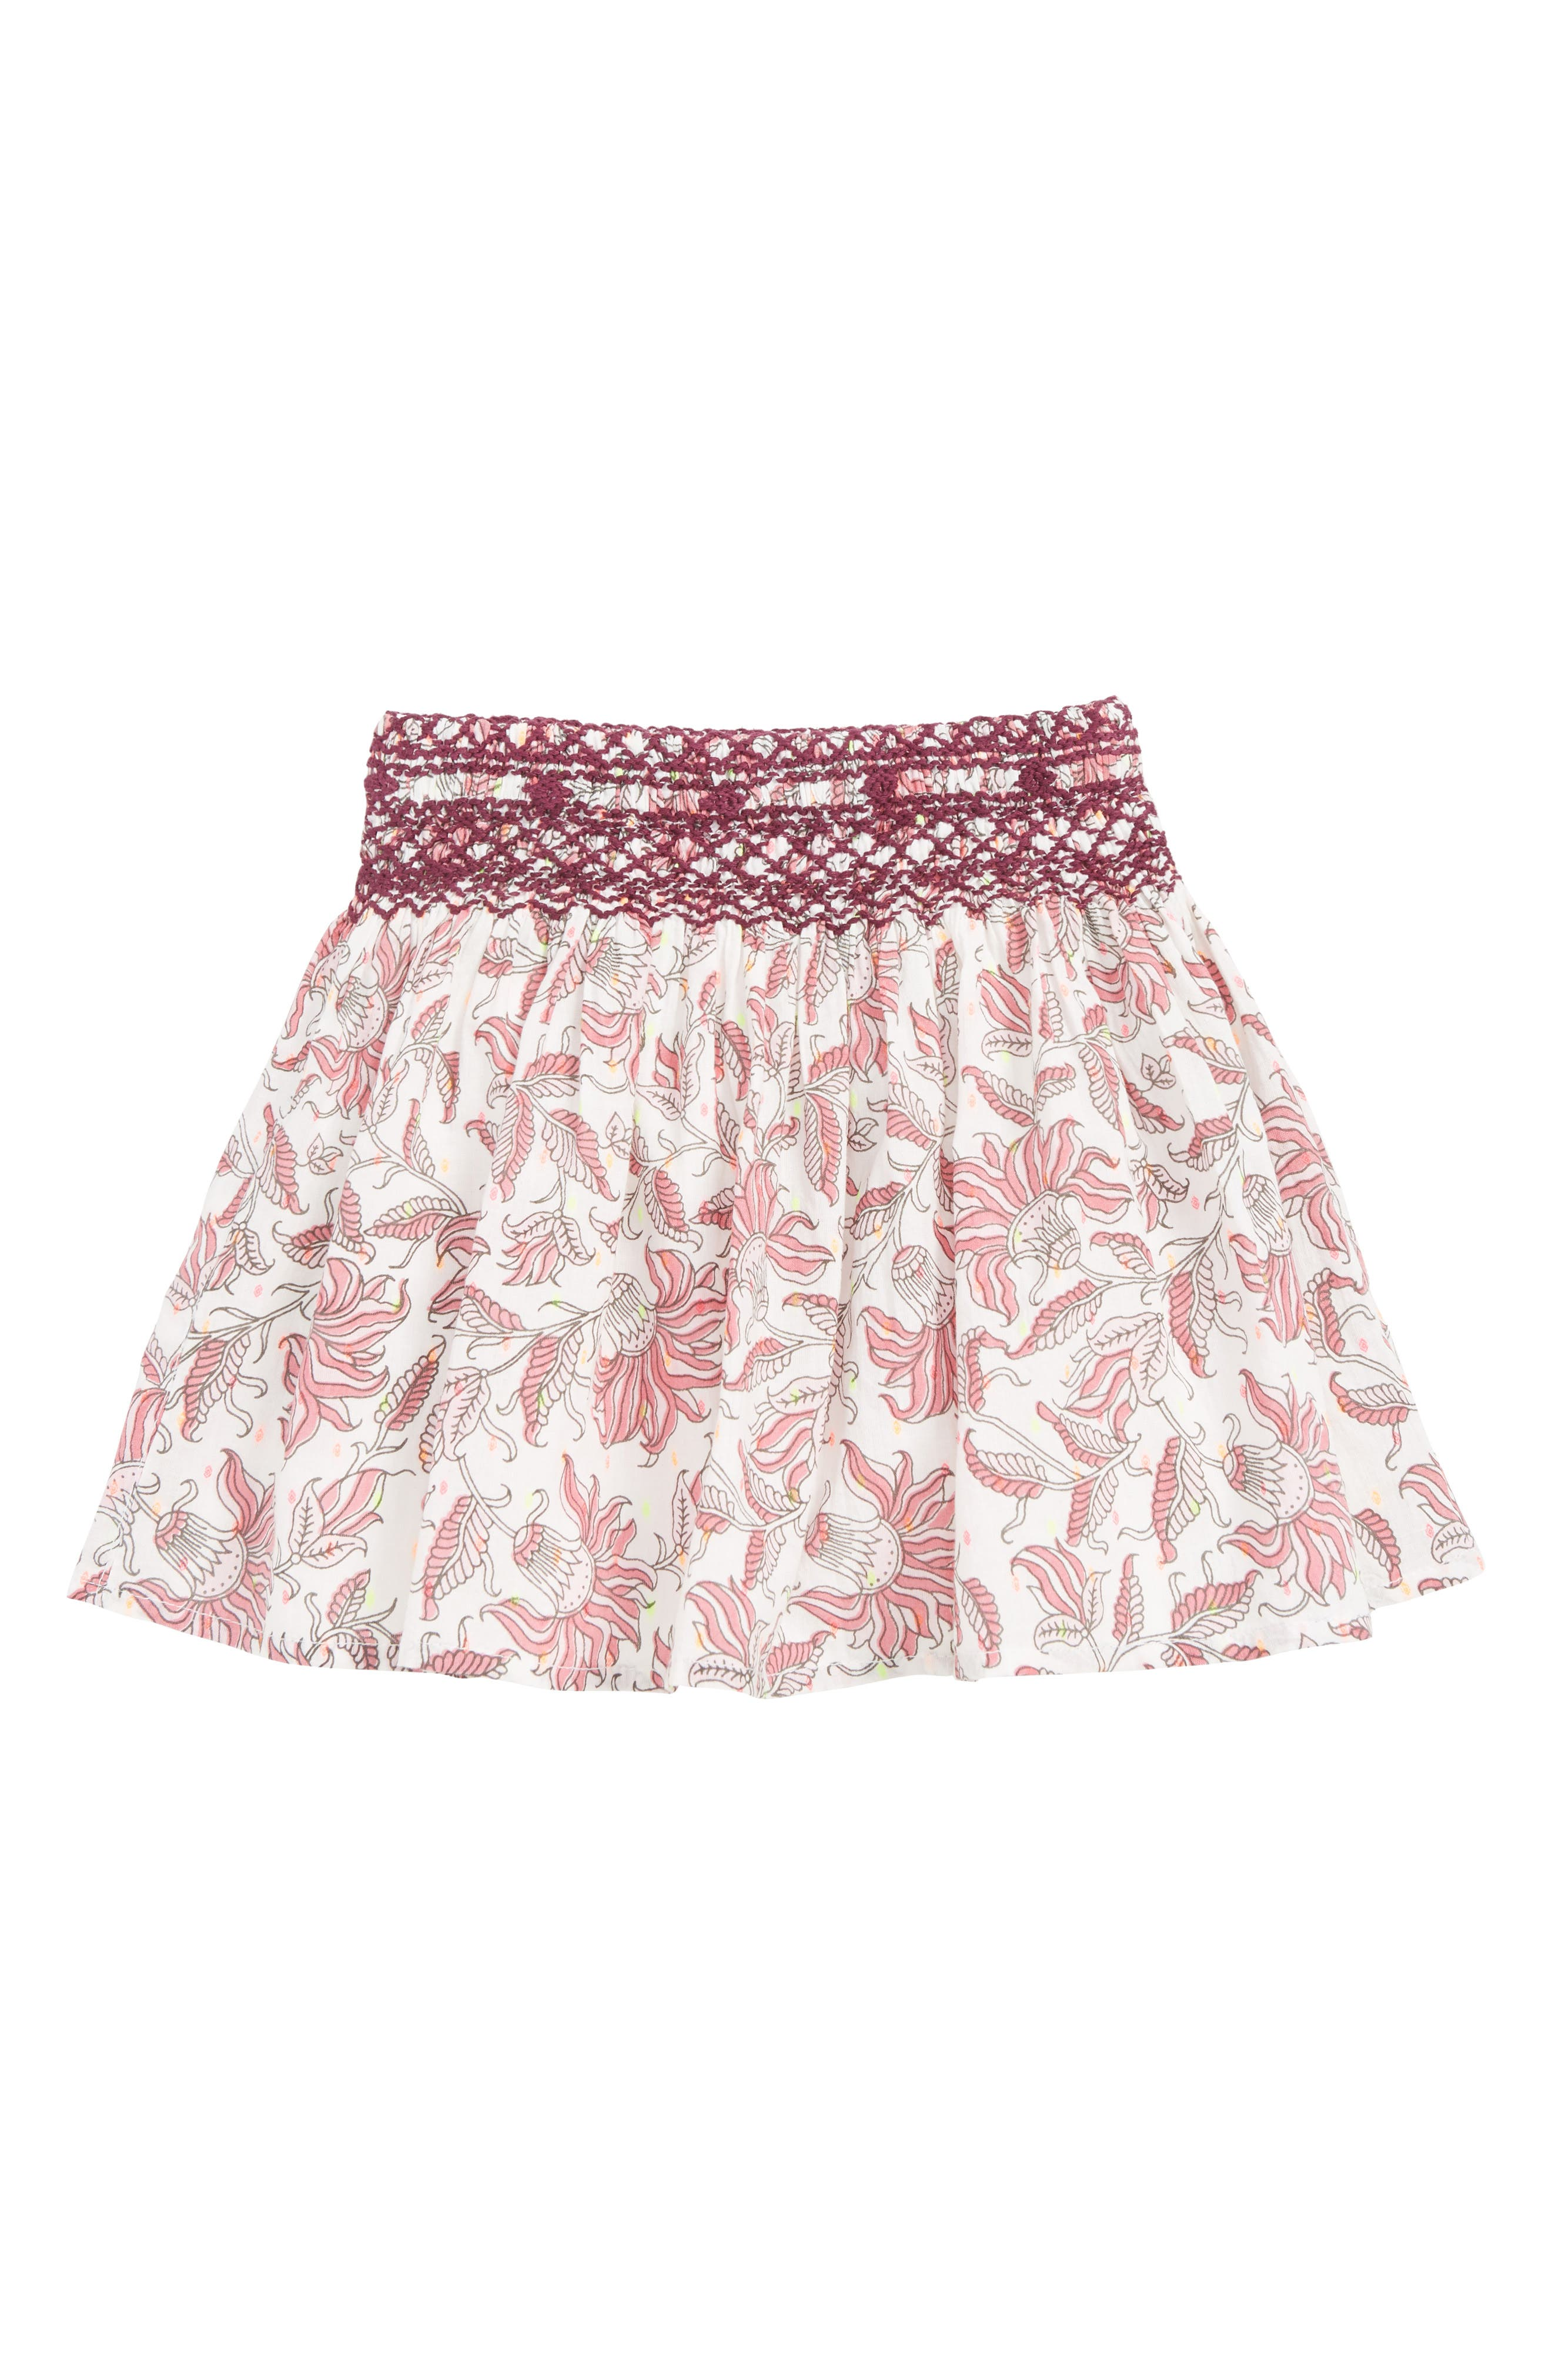 PEEK AREN'T YOU CURIOUS, Peek Floral Pixie Skirt, Main thumbnail 1, color, PINK